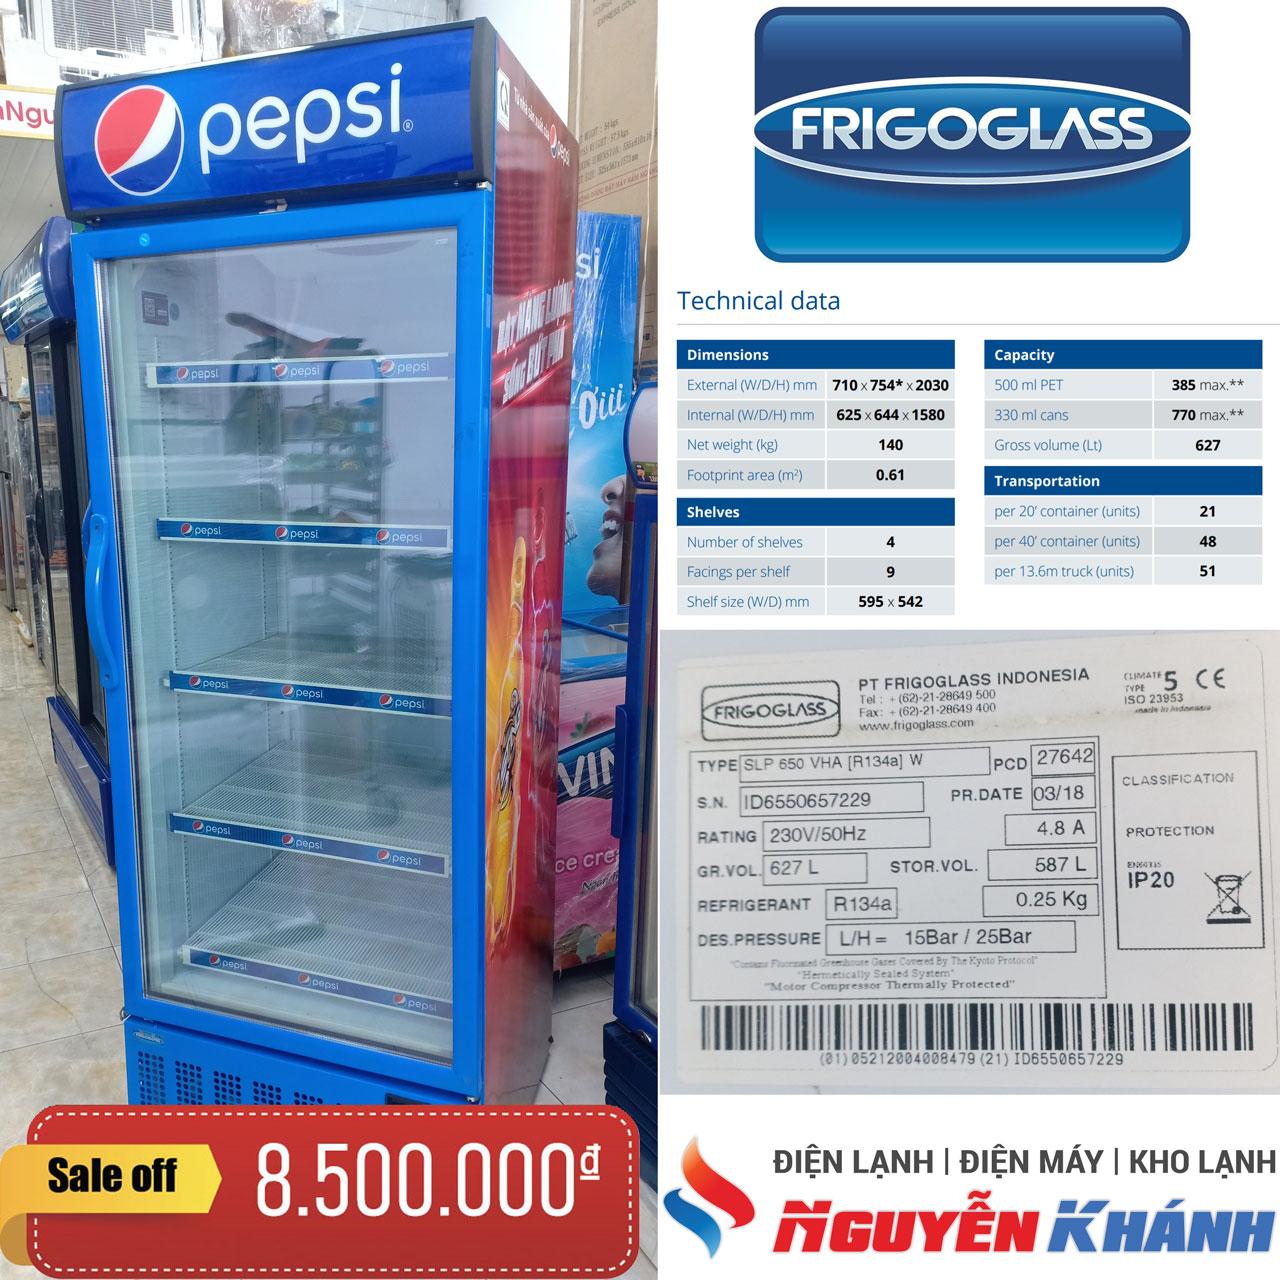 Tủ mát Pepsi Frigoglass SLP-650-VHA 650 lít